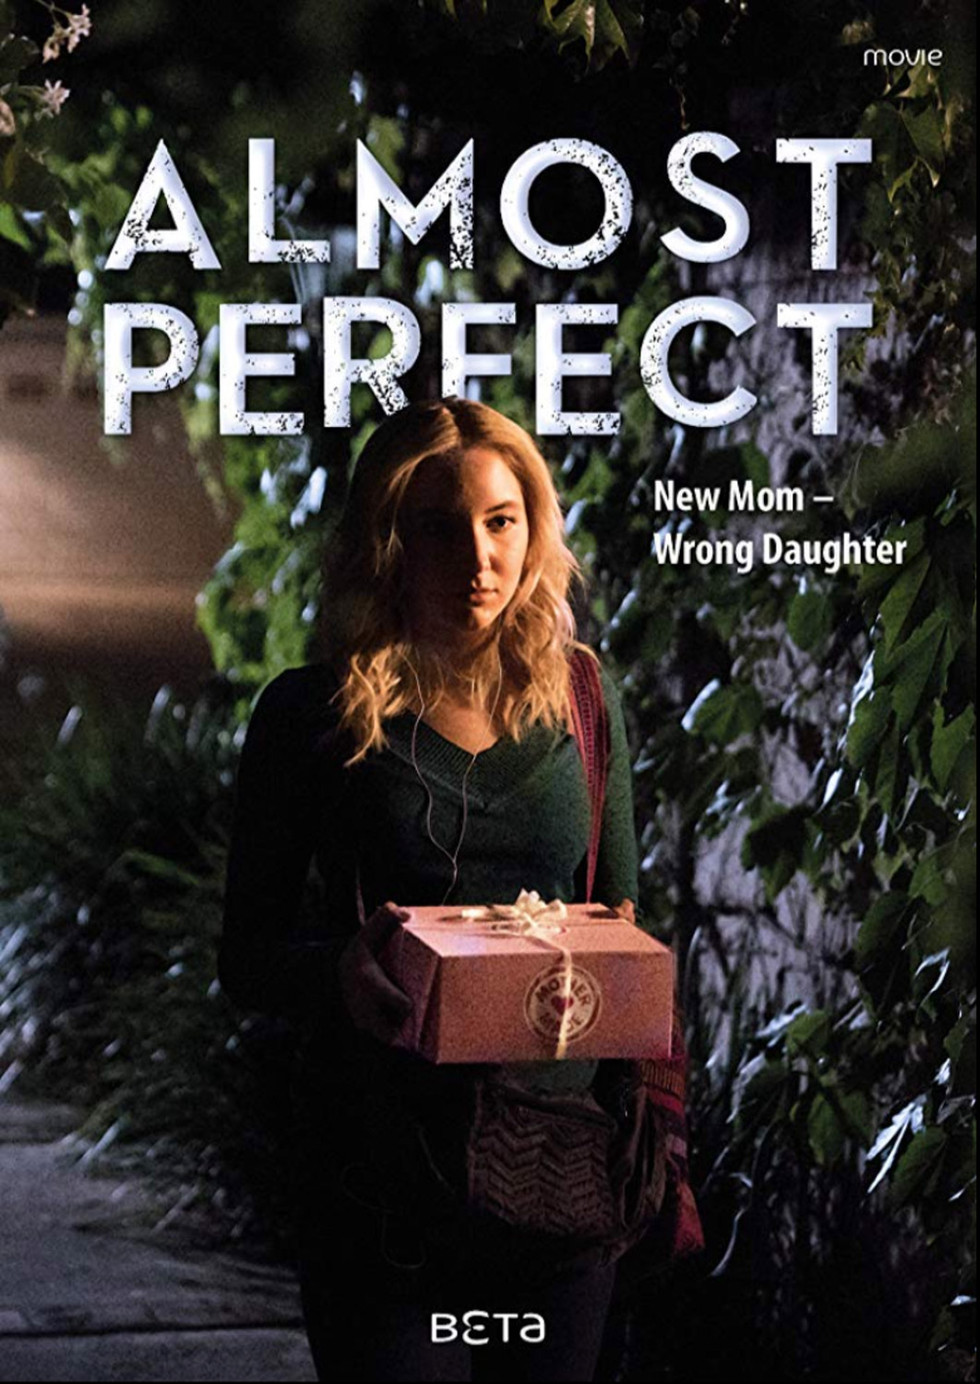 AlmostPerfect-Poster2.jpg